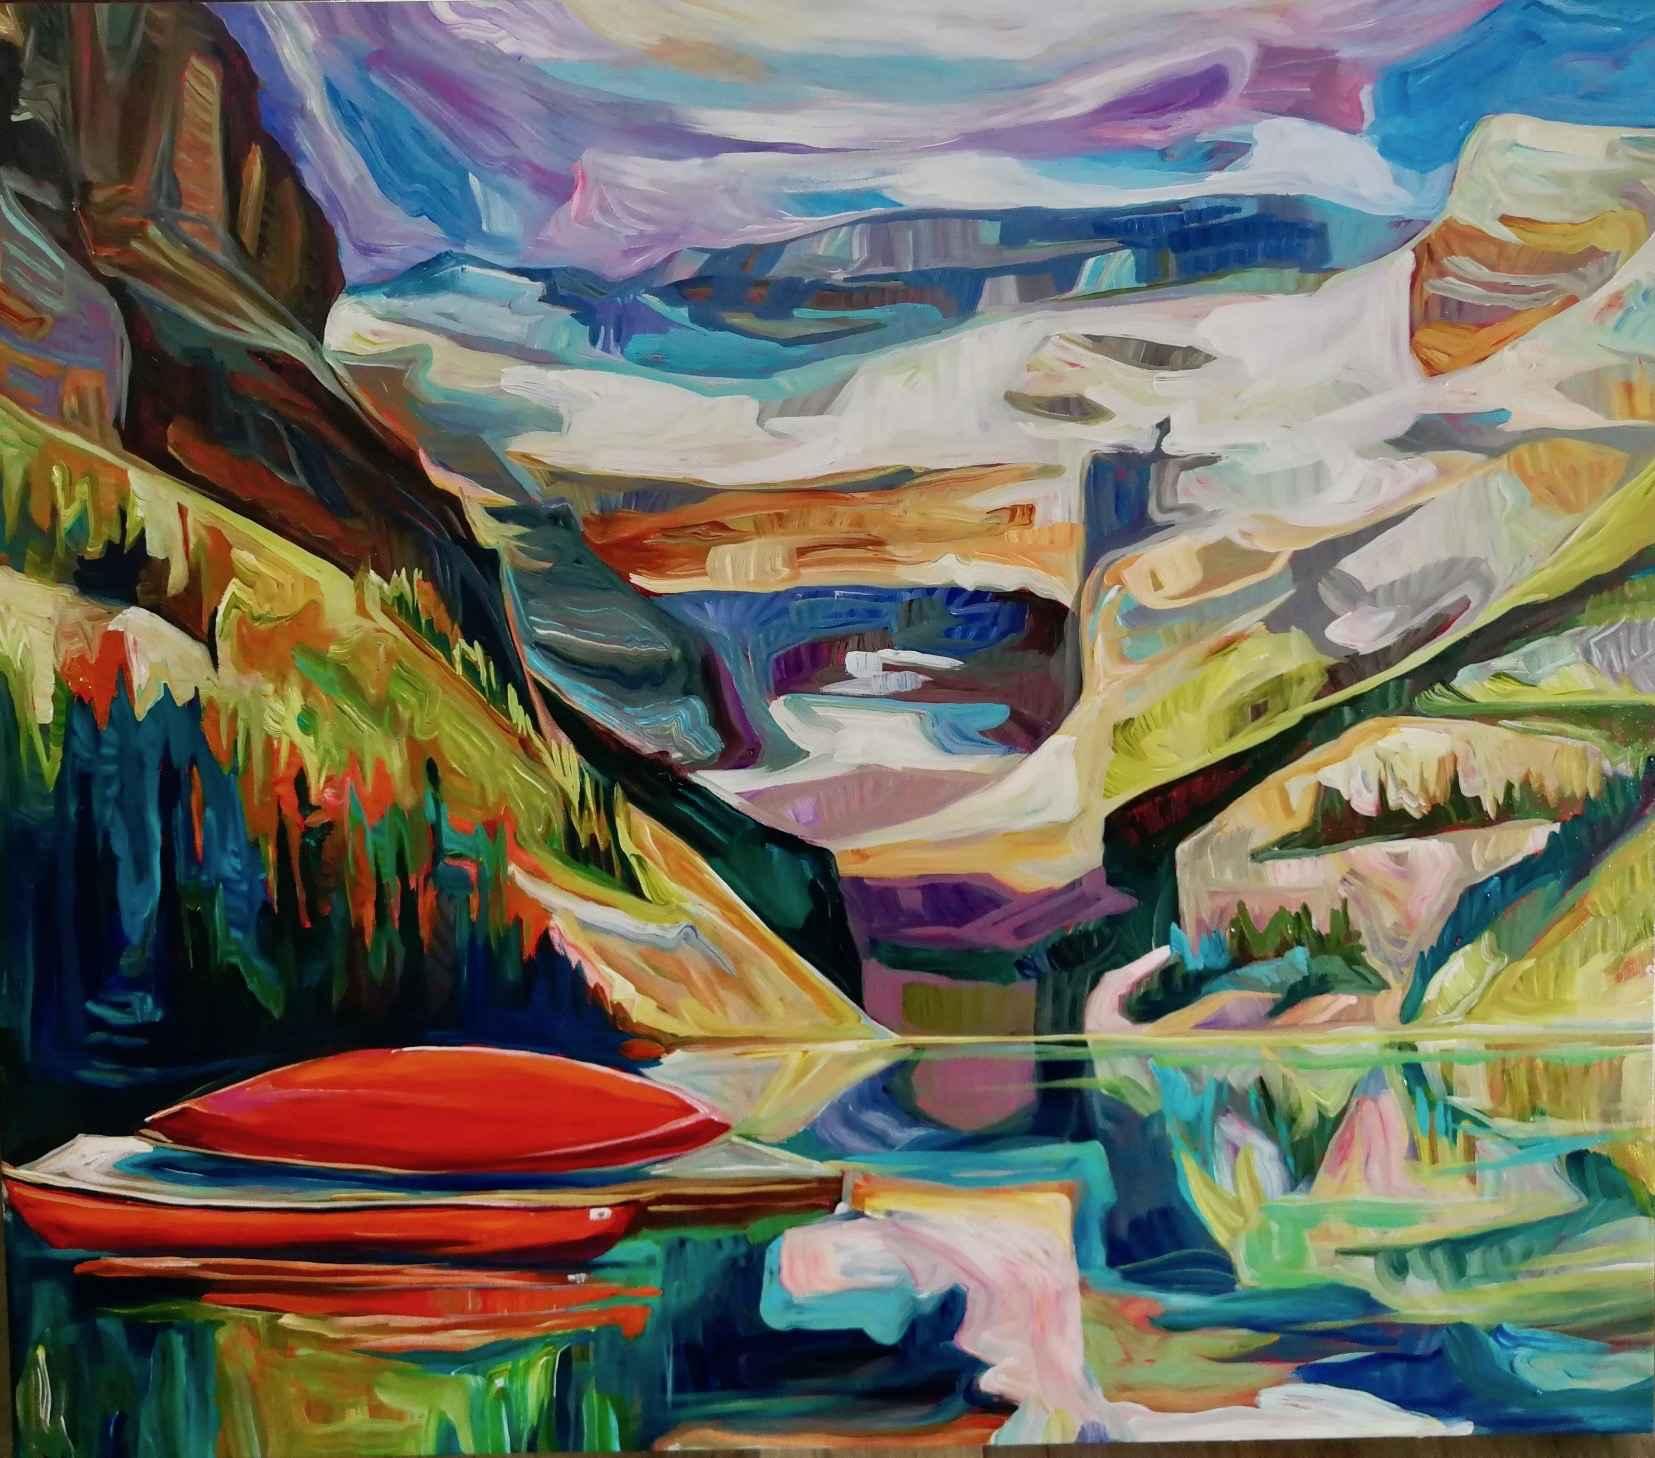 Red Canoe by  Julia Veenstra - Masterpiece Online